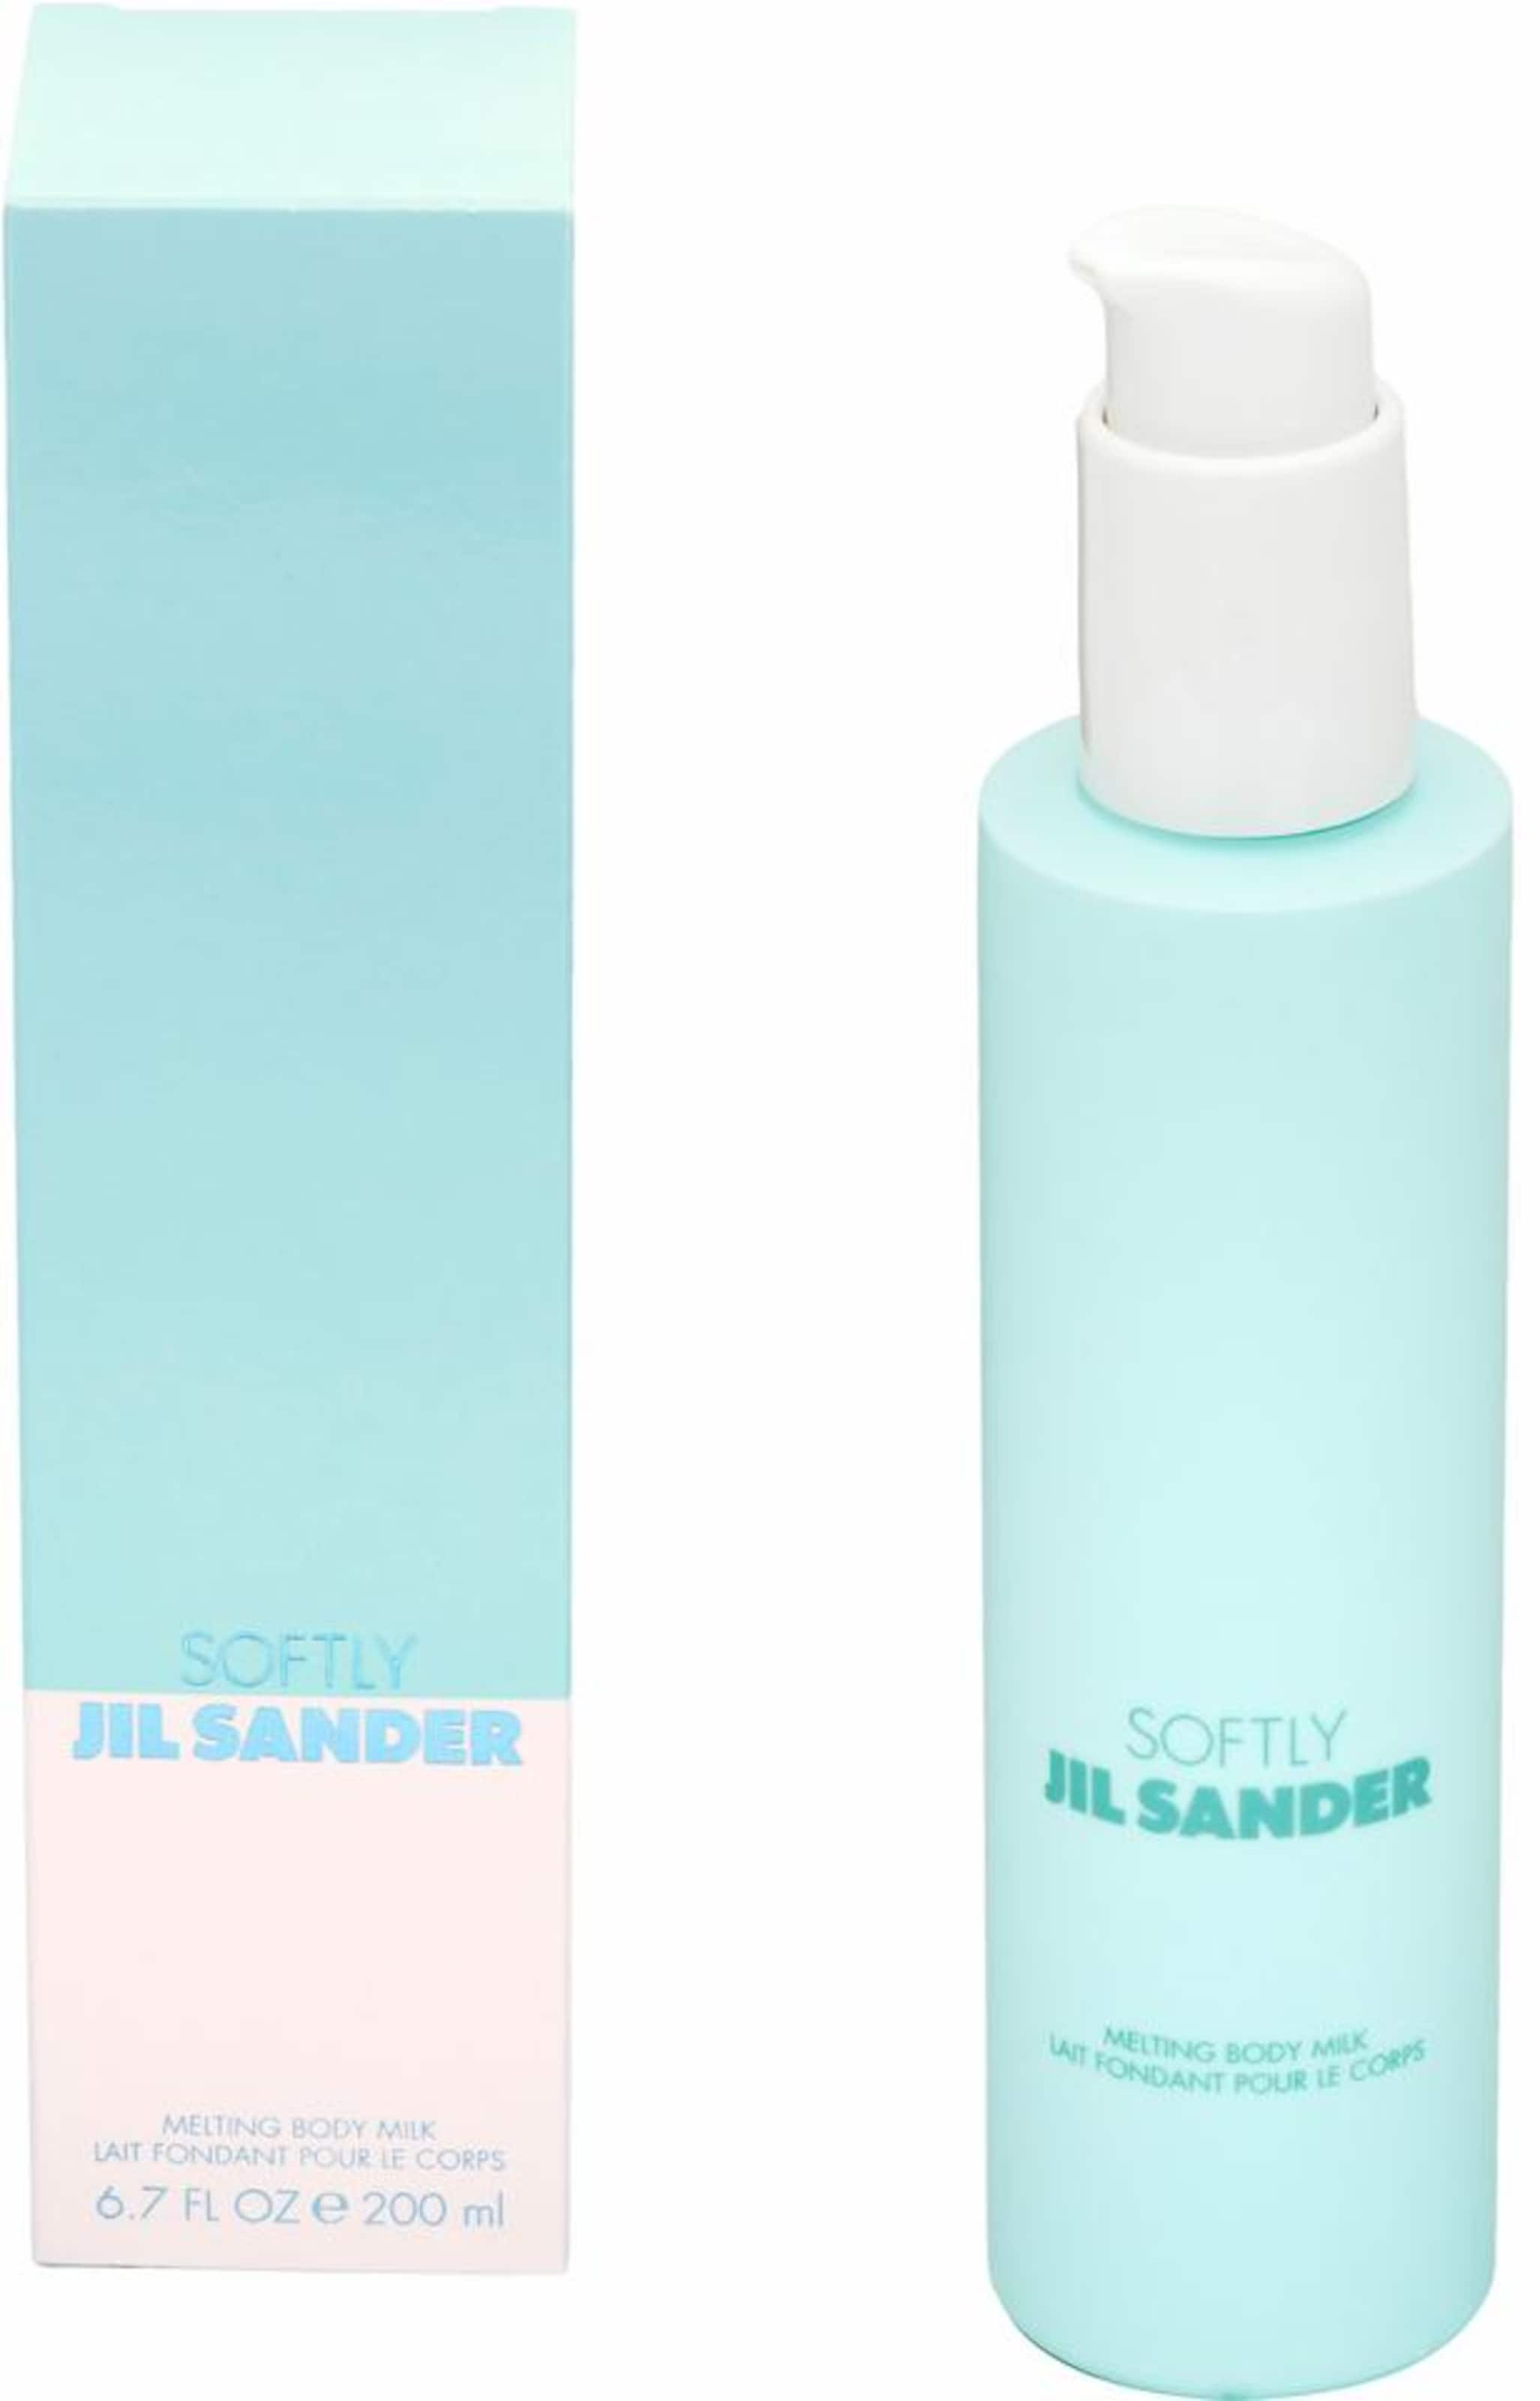 JIL SANDER 'Softly', Bodylotion